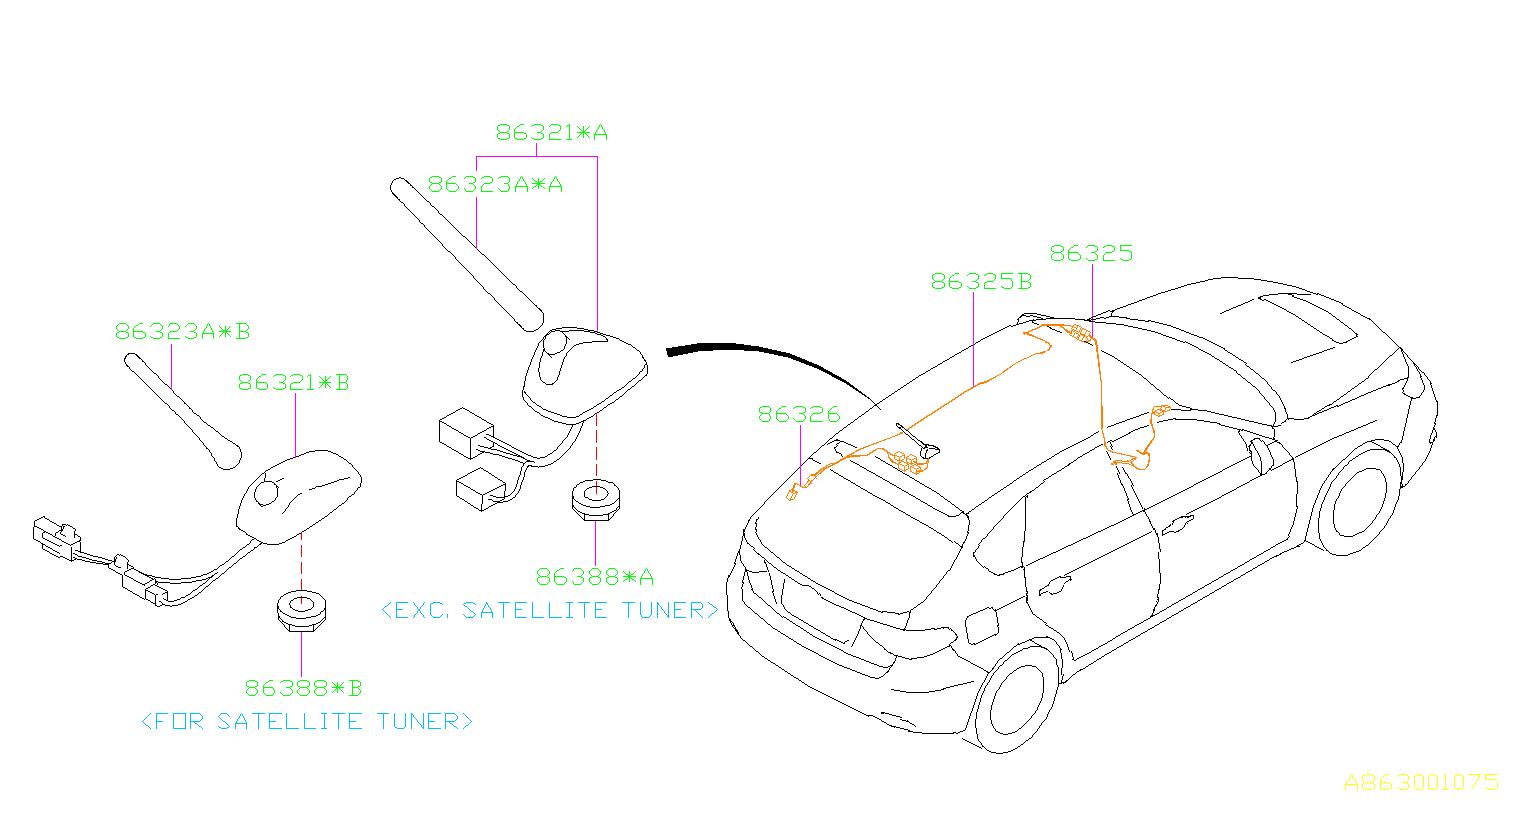 2009 subaru impreza antenna assembly-radio  electrical  audio - 86321fg700